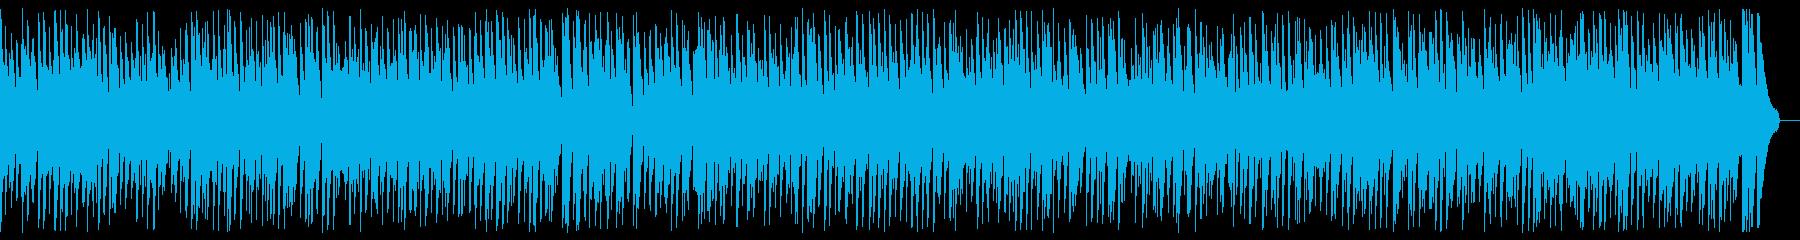 Romantic gentle cute jazz BGM's reproduced waveform